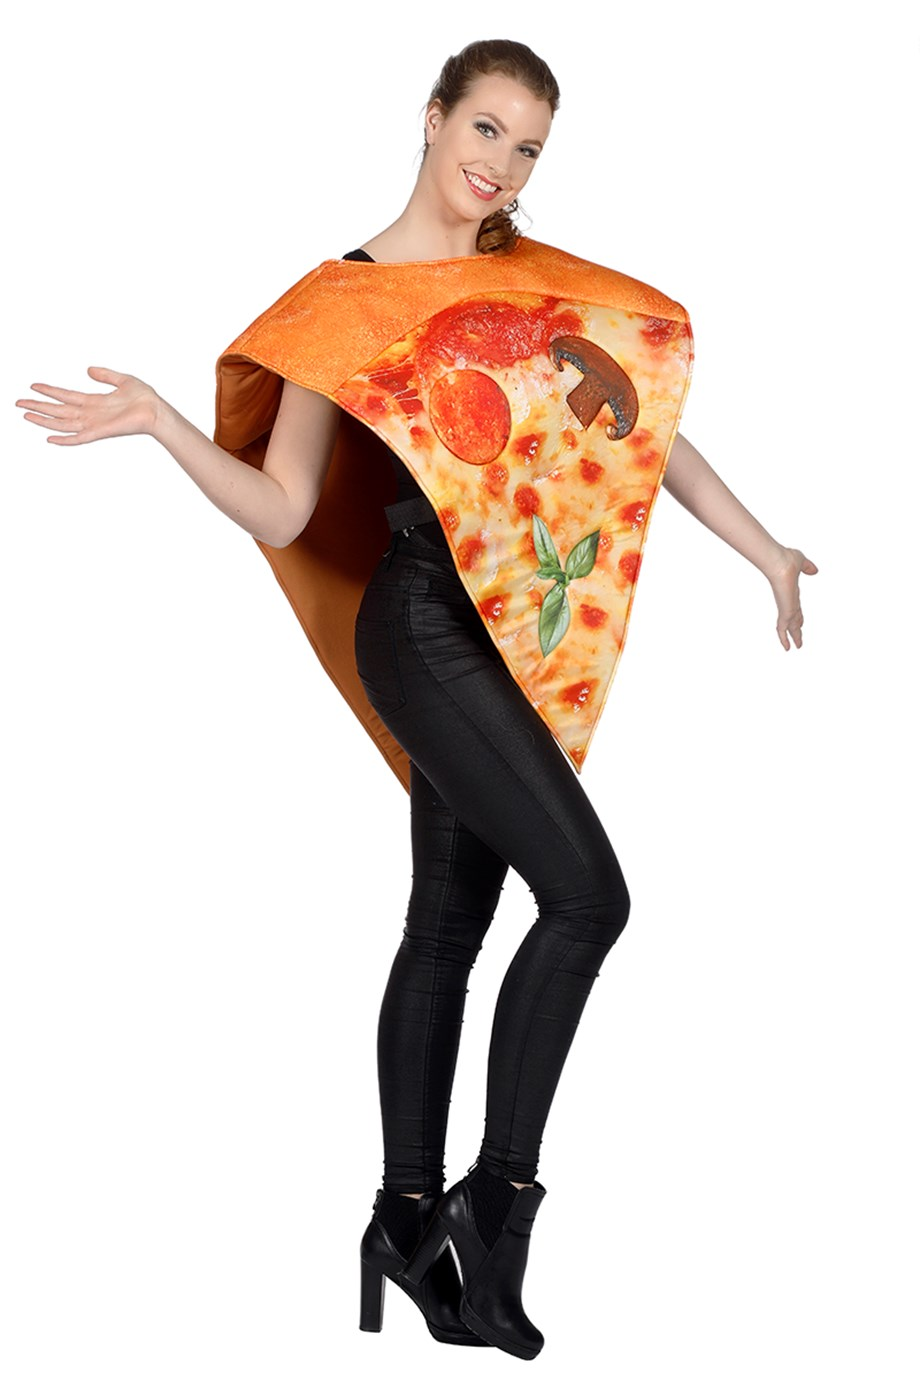 Pizzapunt-258443